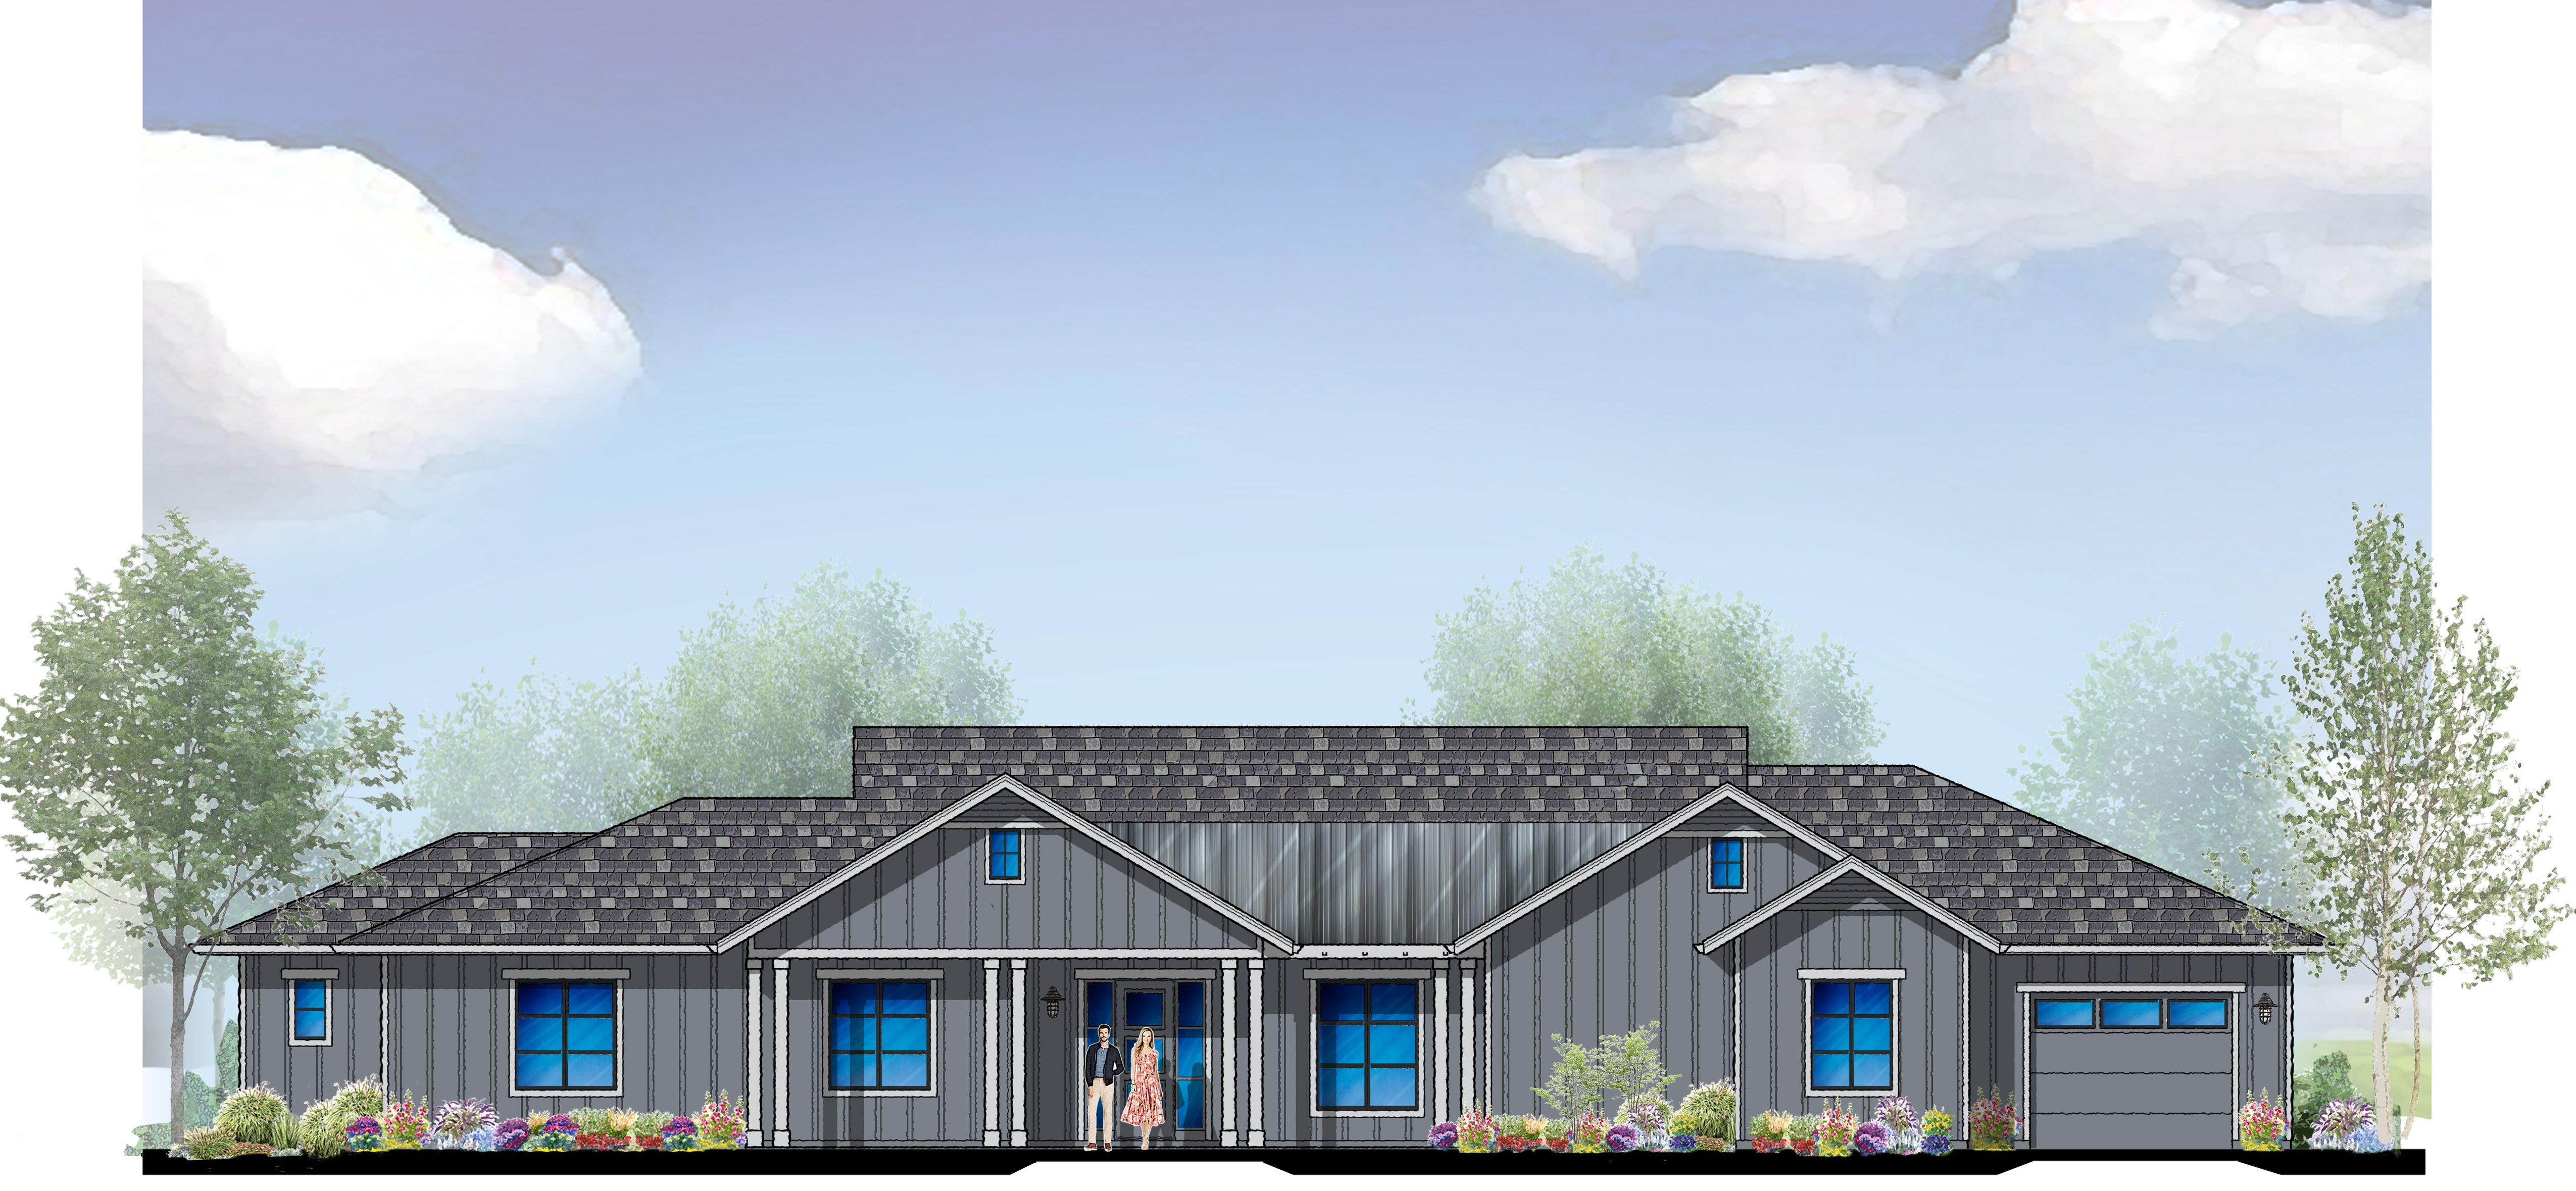 3364-Modern-Farmhouse-Elevation-4.25.18-e1528416650865